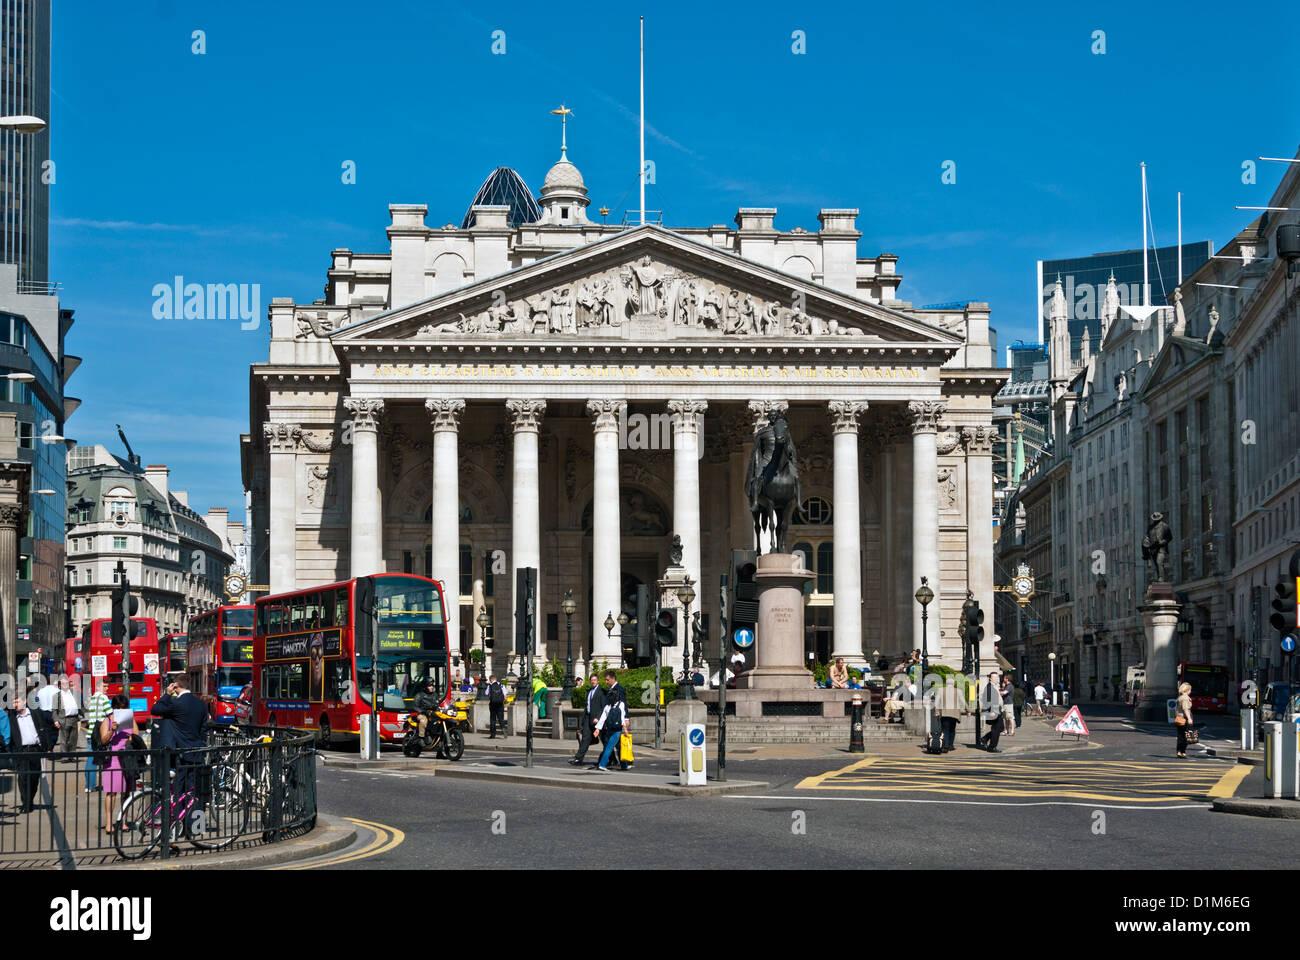 The Royal Exchange, London - Stock Image